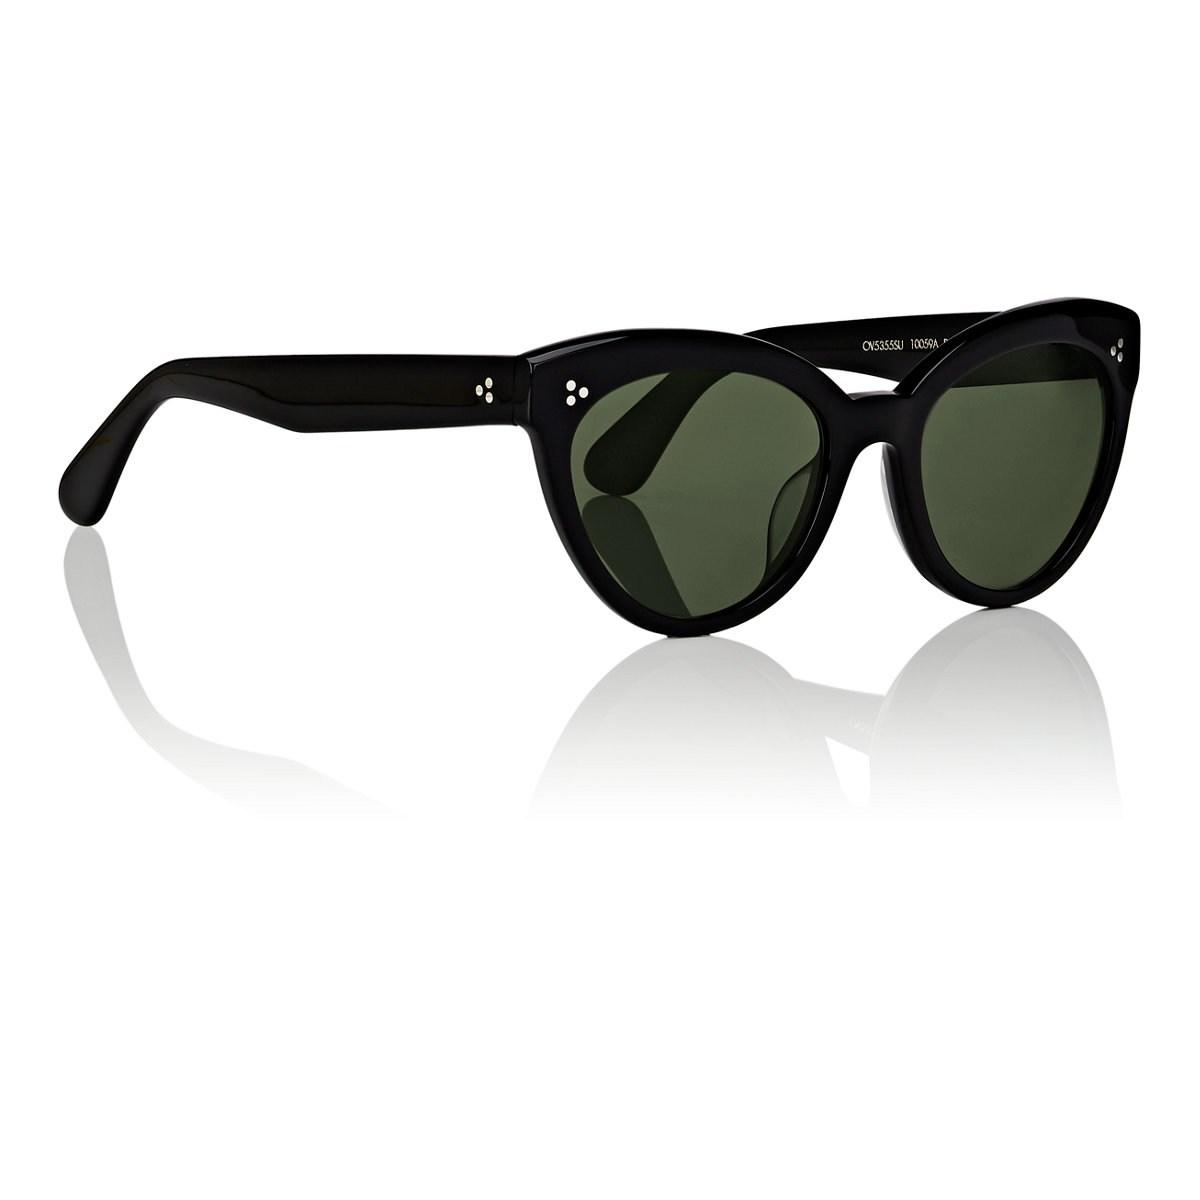 e36153767d75 Oliver Peoples - Black Roella Sunglasses - Lyst. View fullscreen